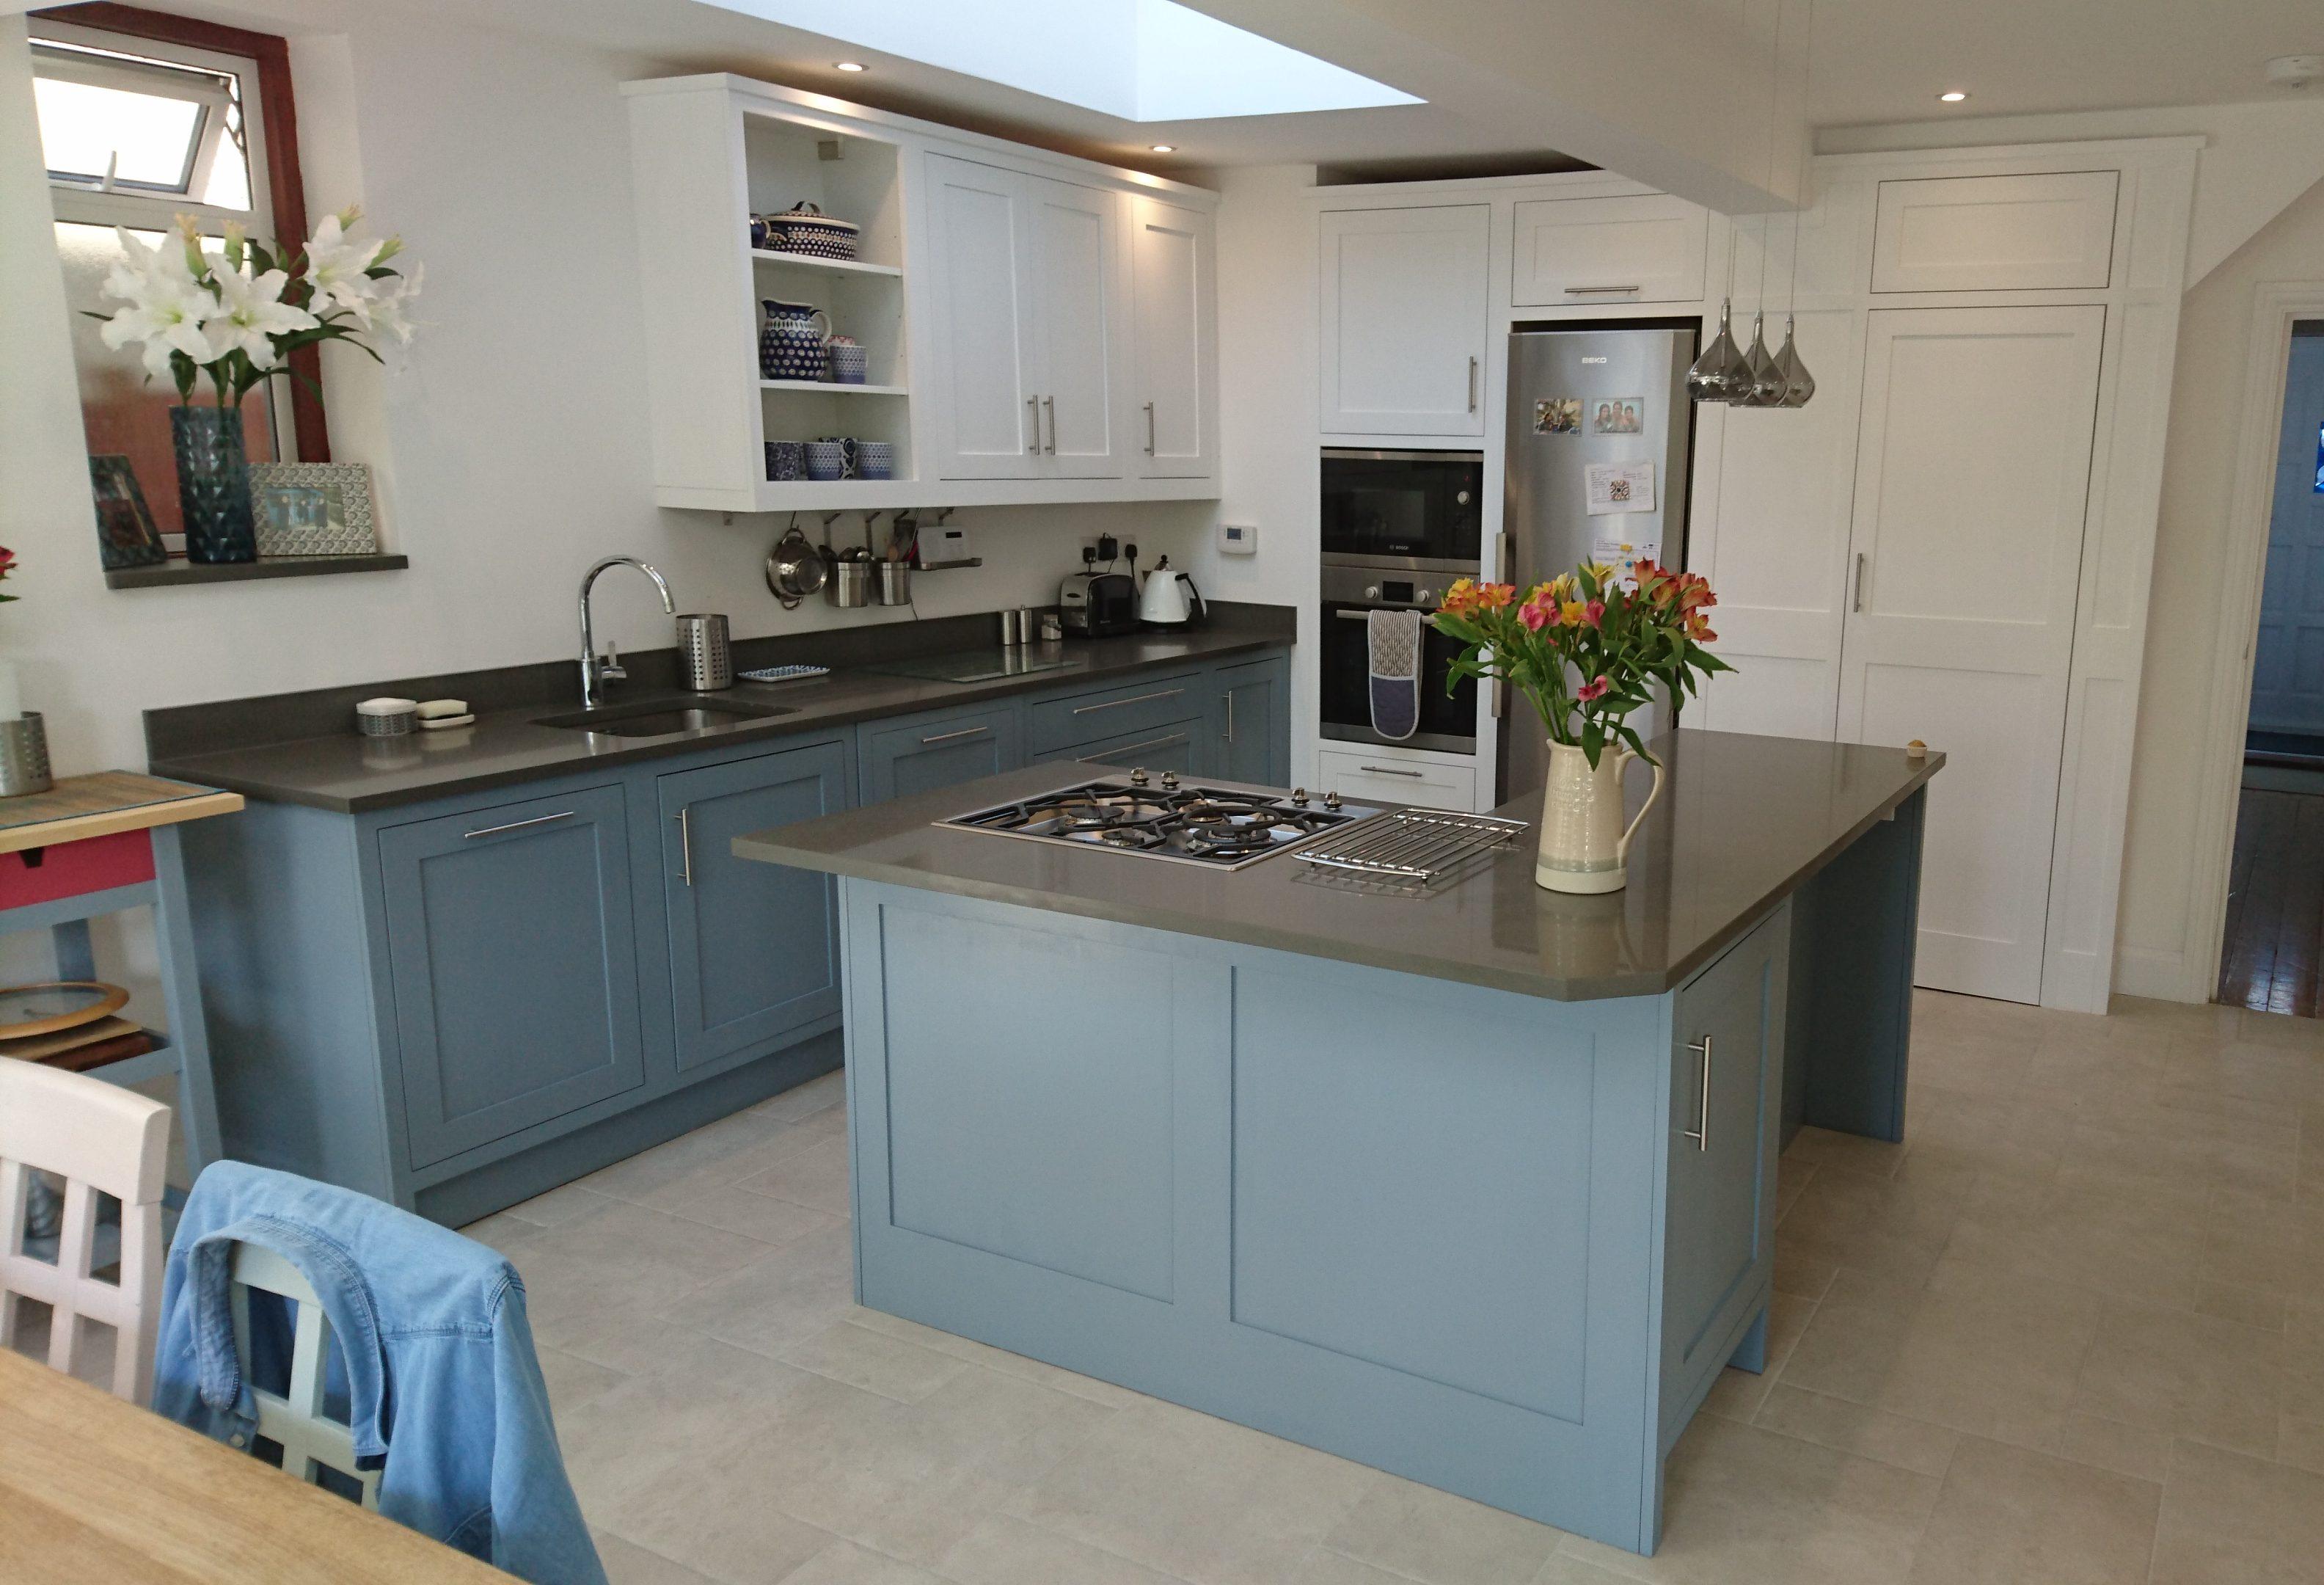 Bespoke Kitchen In Wembley By Celtica Kitchens L Shaped Island